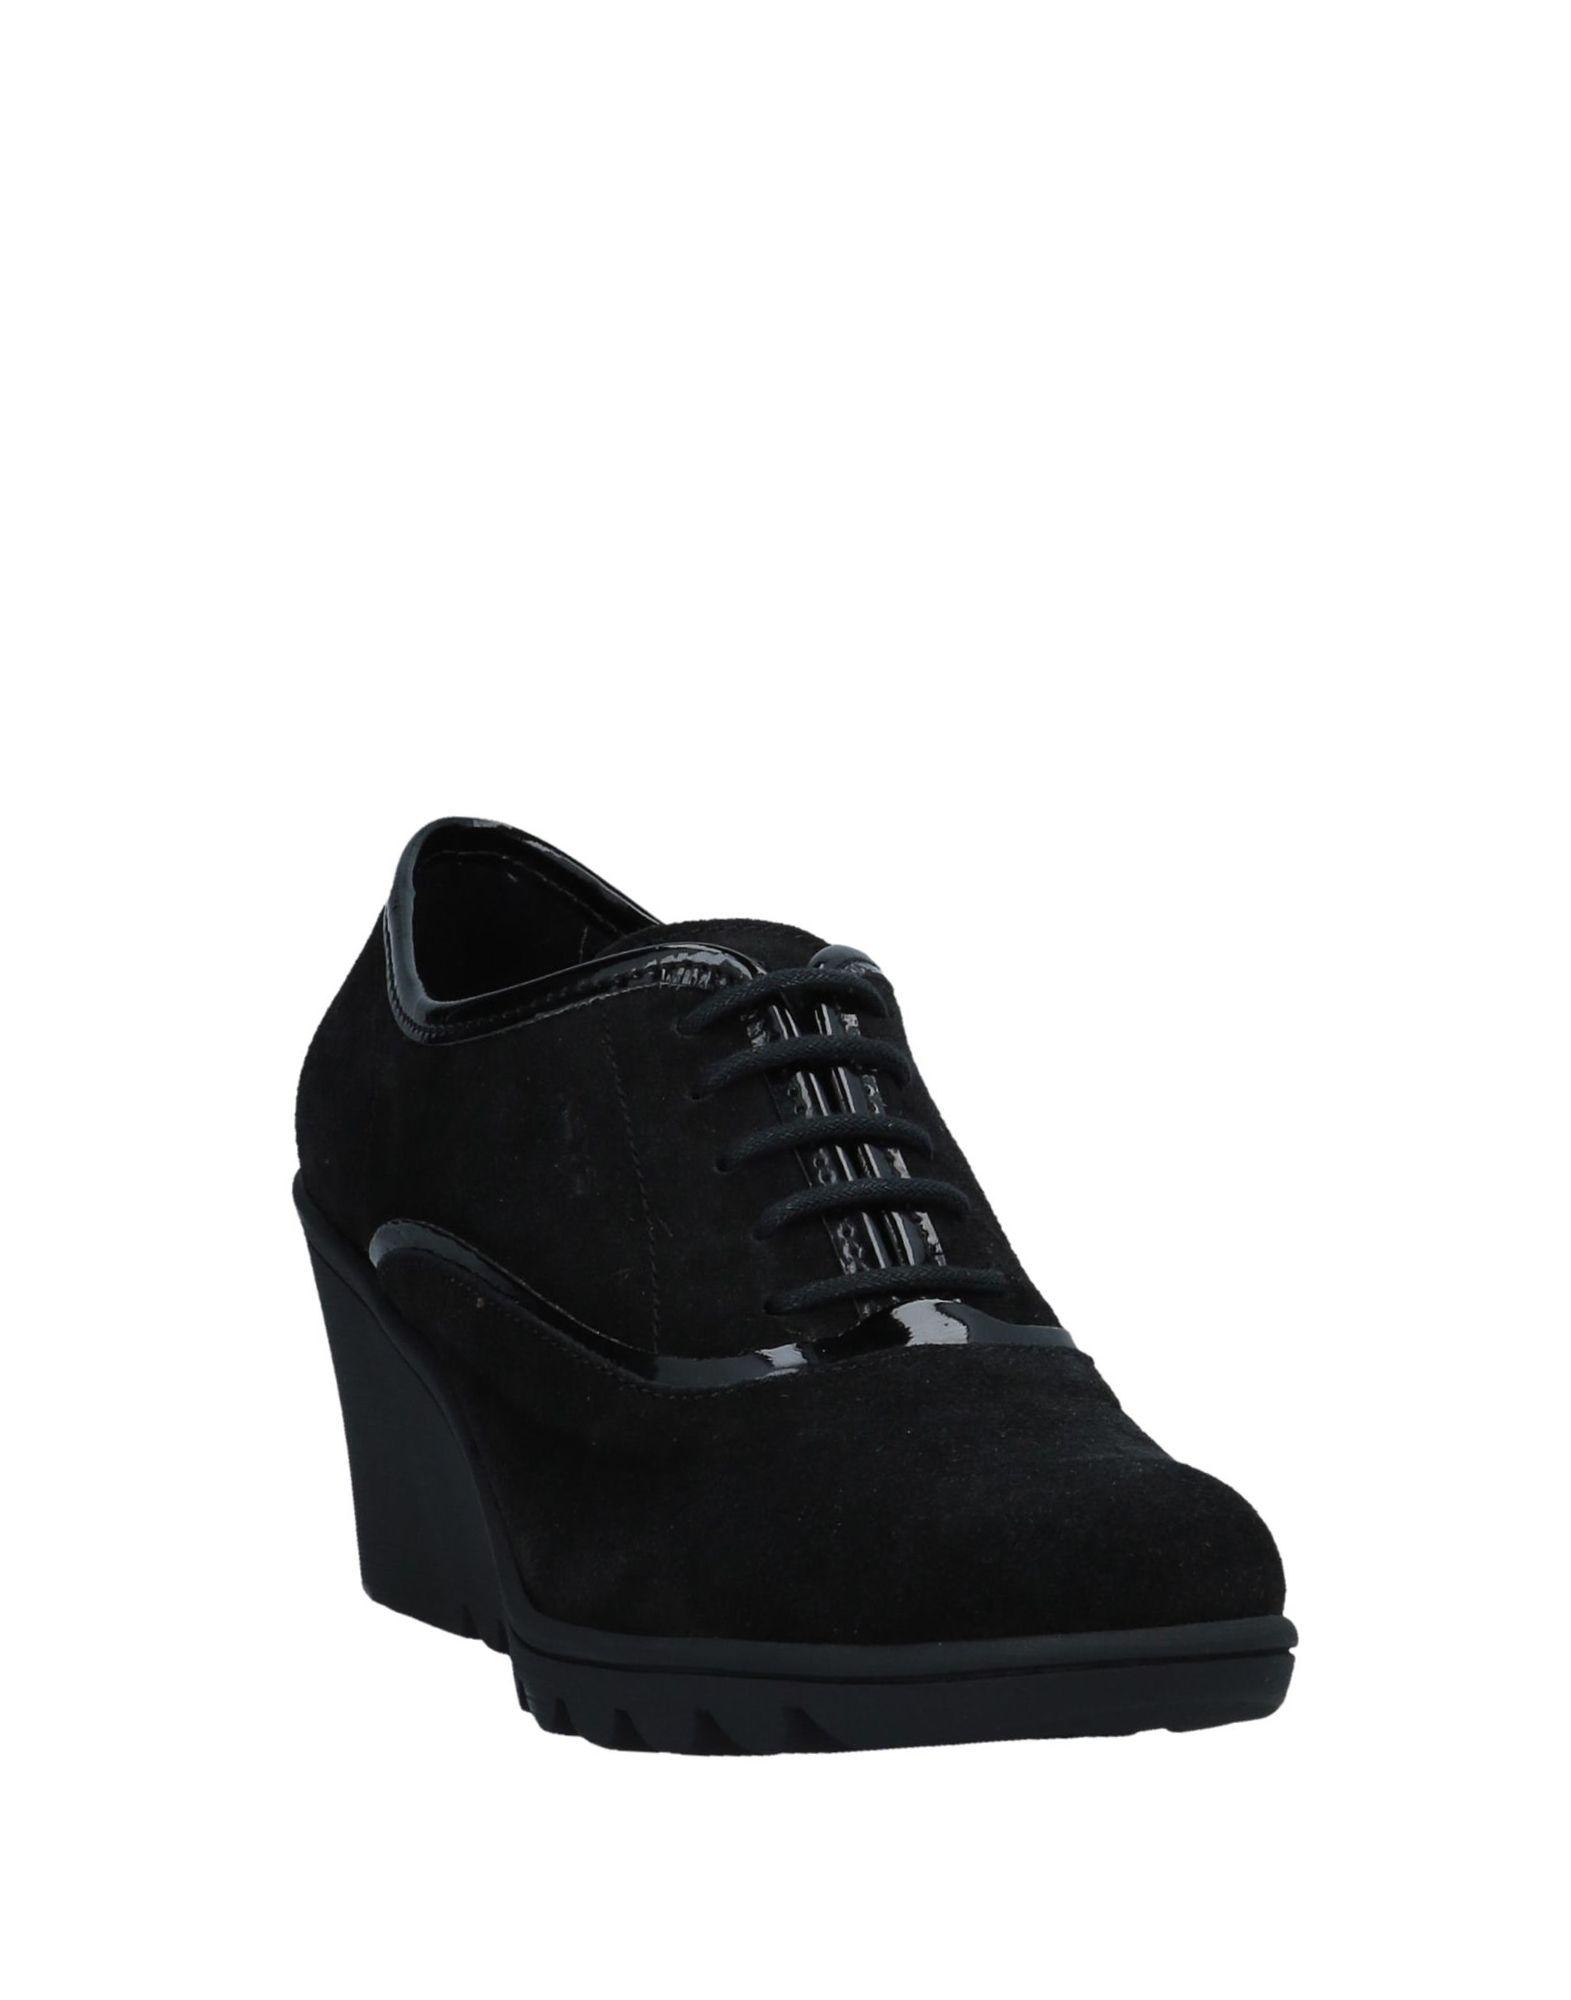 Flex&Fly® By Keys Schnürschuhe 11551689JW Damen 11551689JW Schnürschuhe Gute Qualität beliebte Schuhe 09ae8e